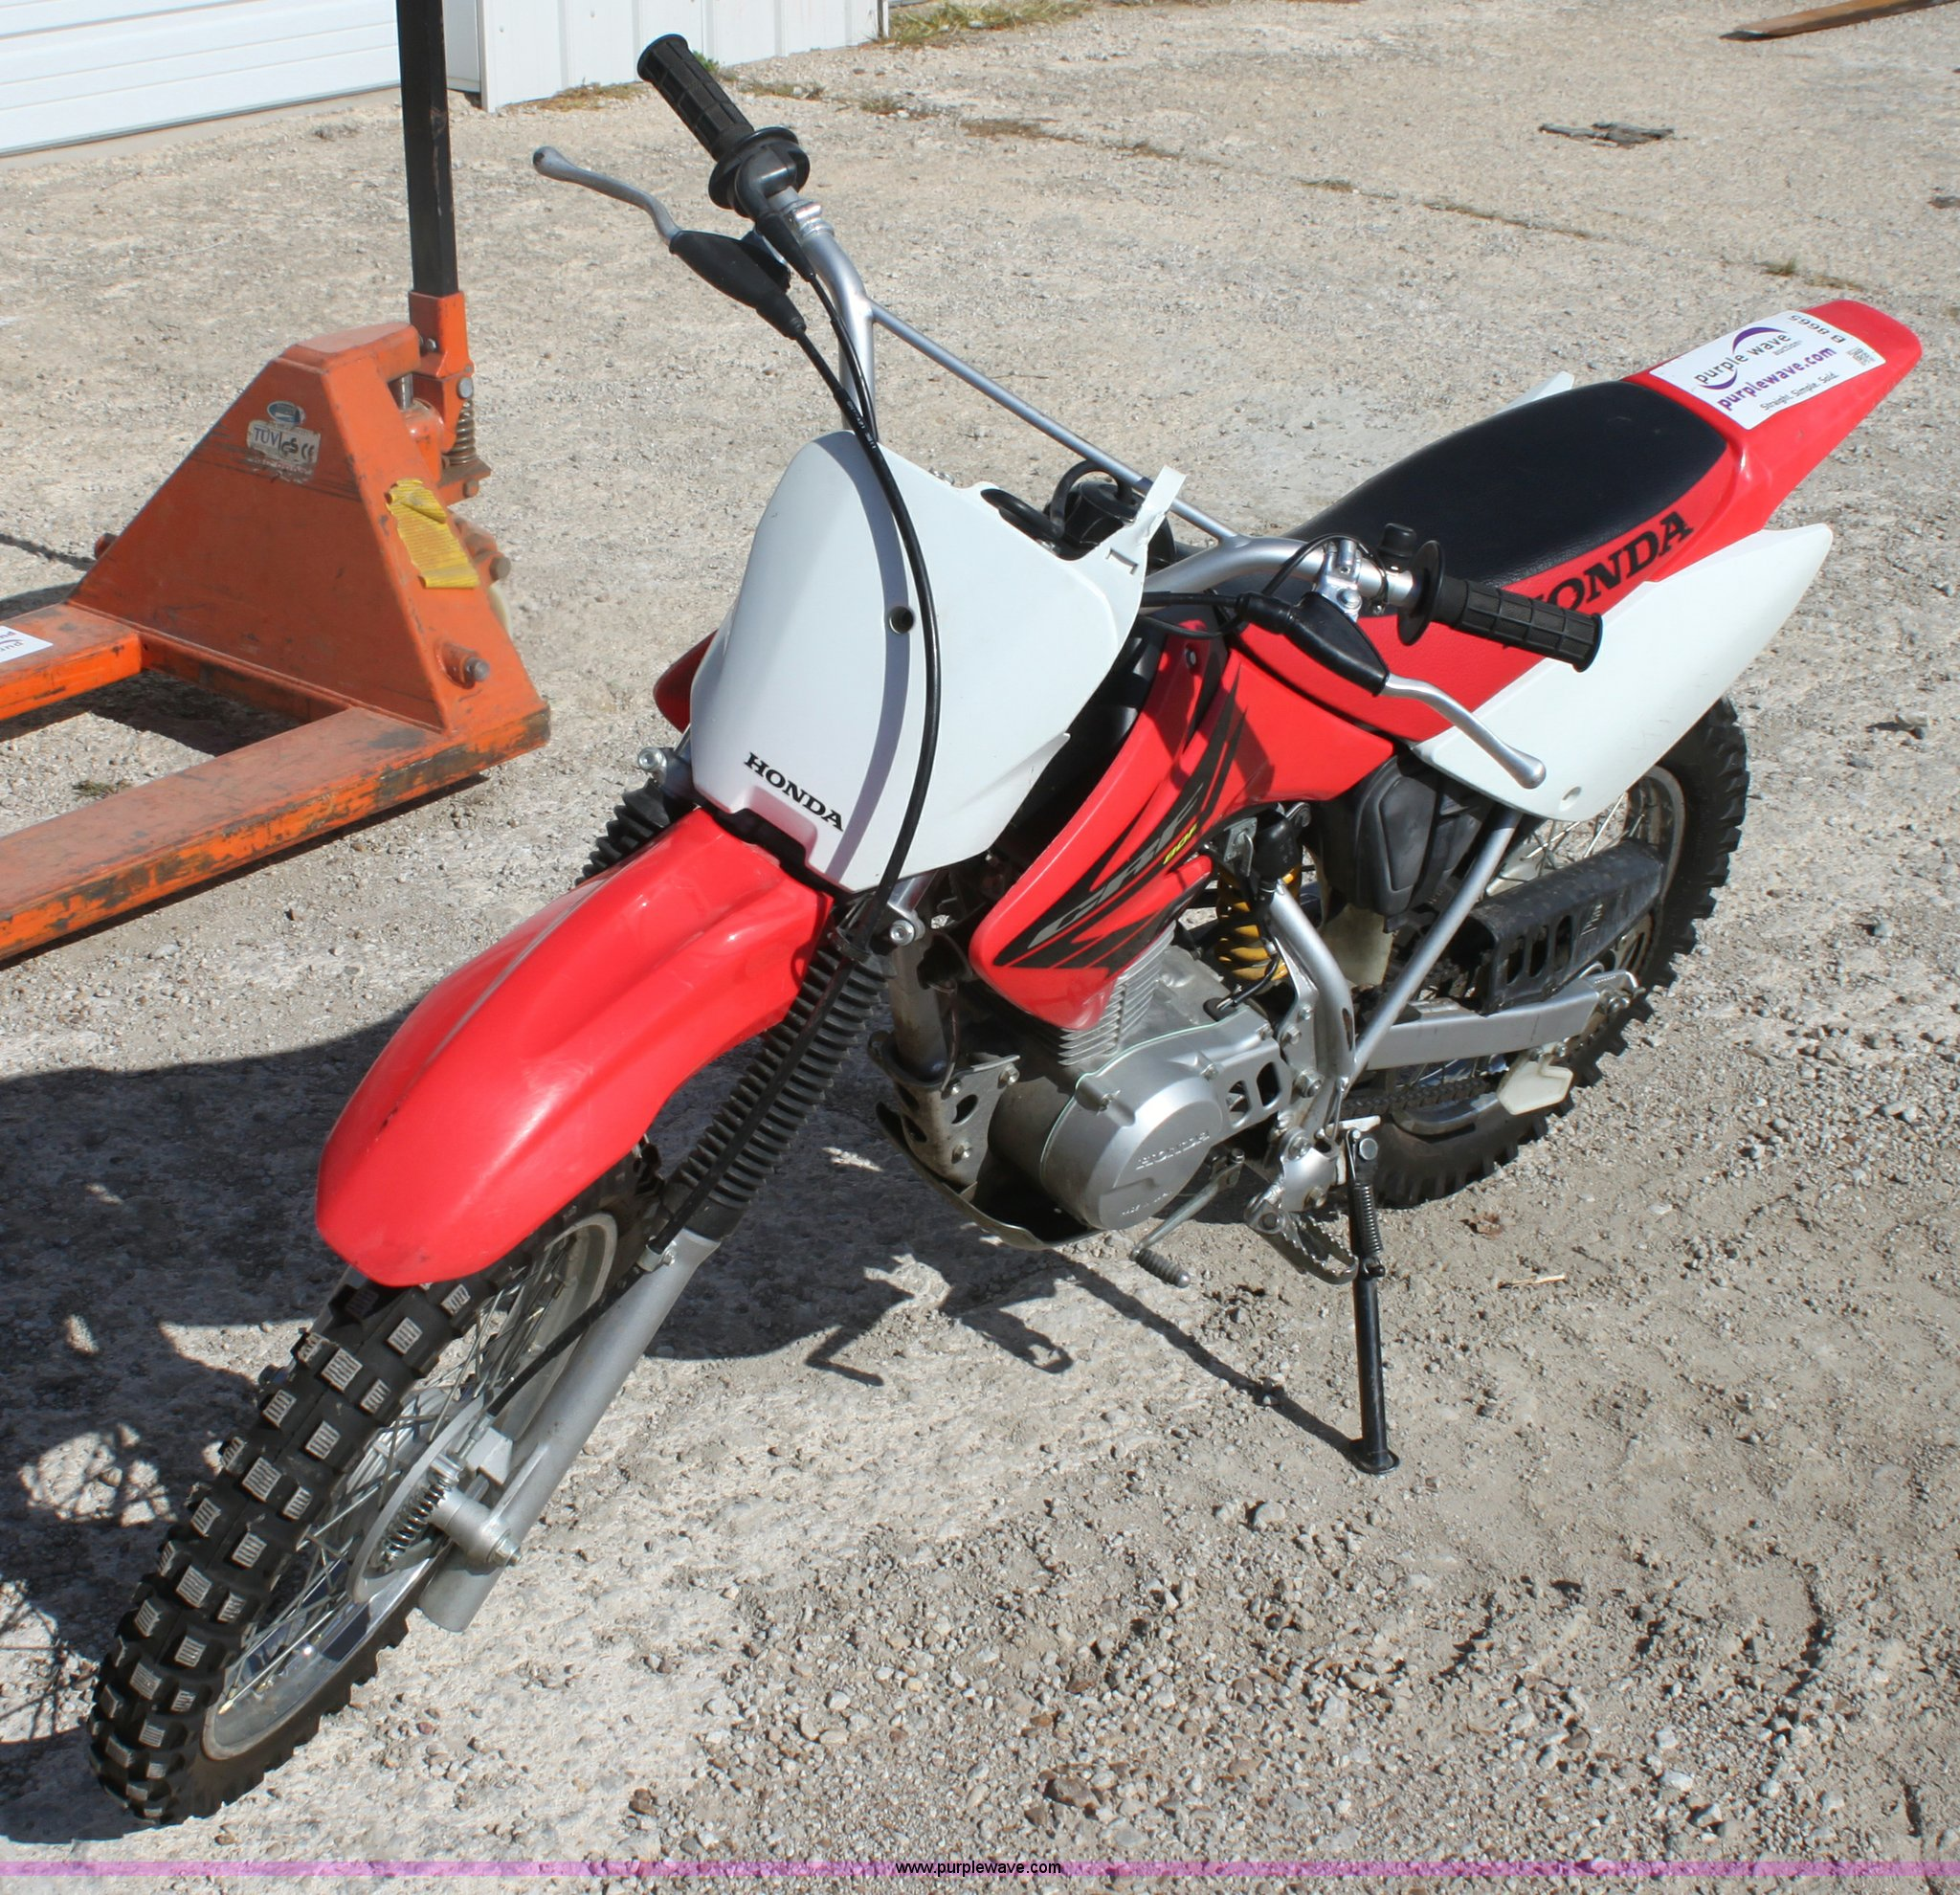 Honda CRF 80cc dirt bike | Item B8665 | SOLD! November 30 Mi...